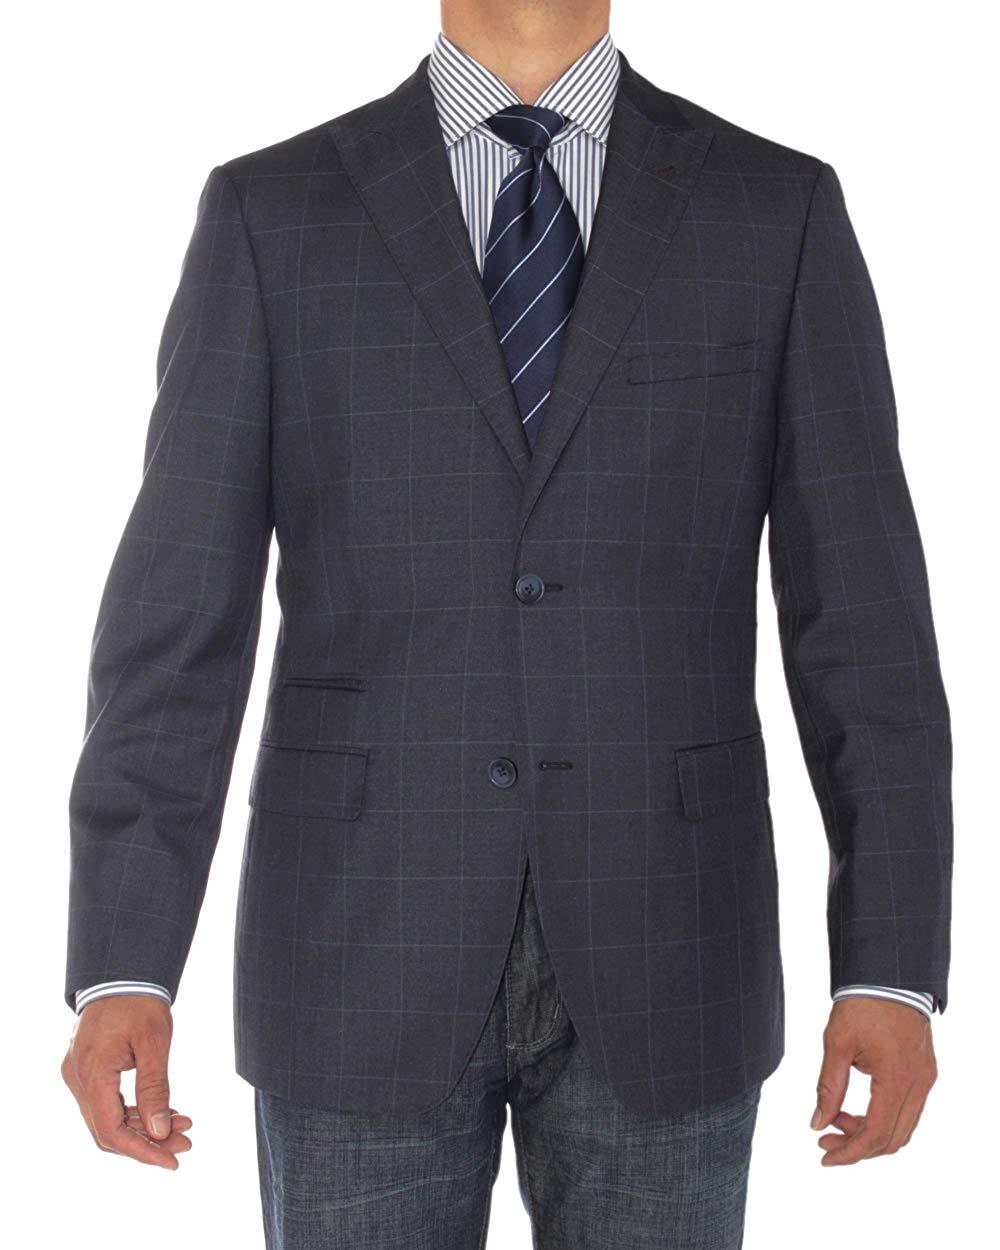 07ec1fd8c26e85 Get Quotations · LN LUCIANO NATAZZI Mens Two Button Ticket Pocket Blazer  Modern Fit Suit Jacket